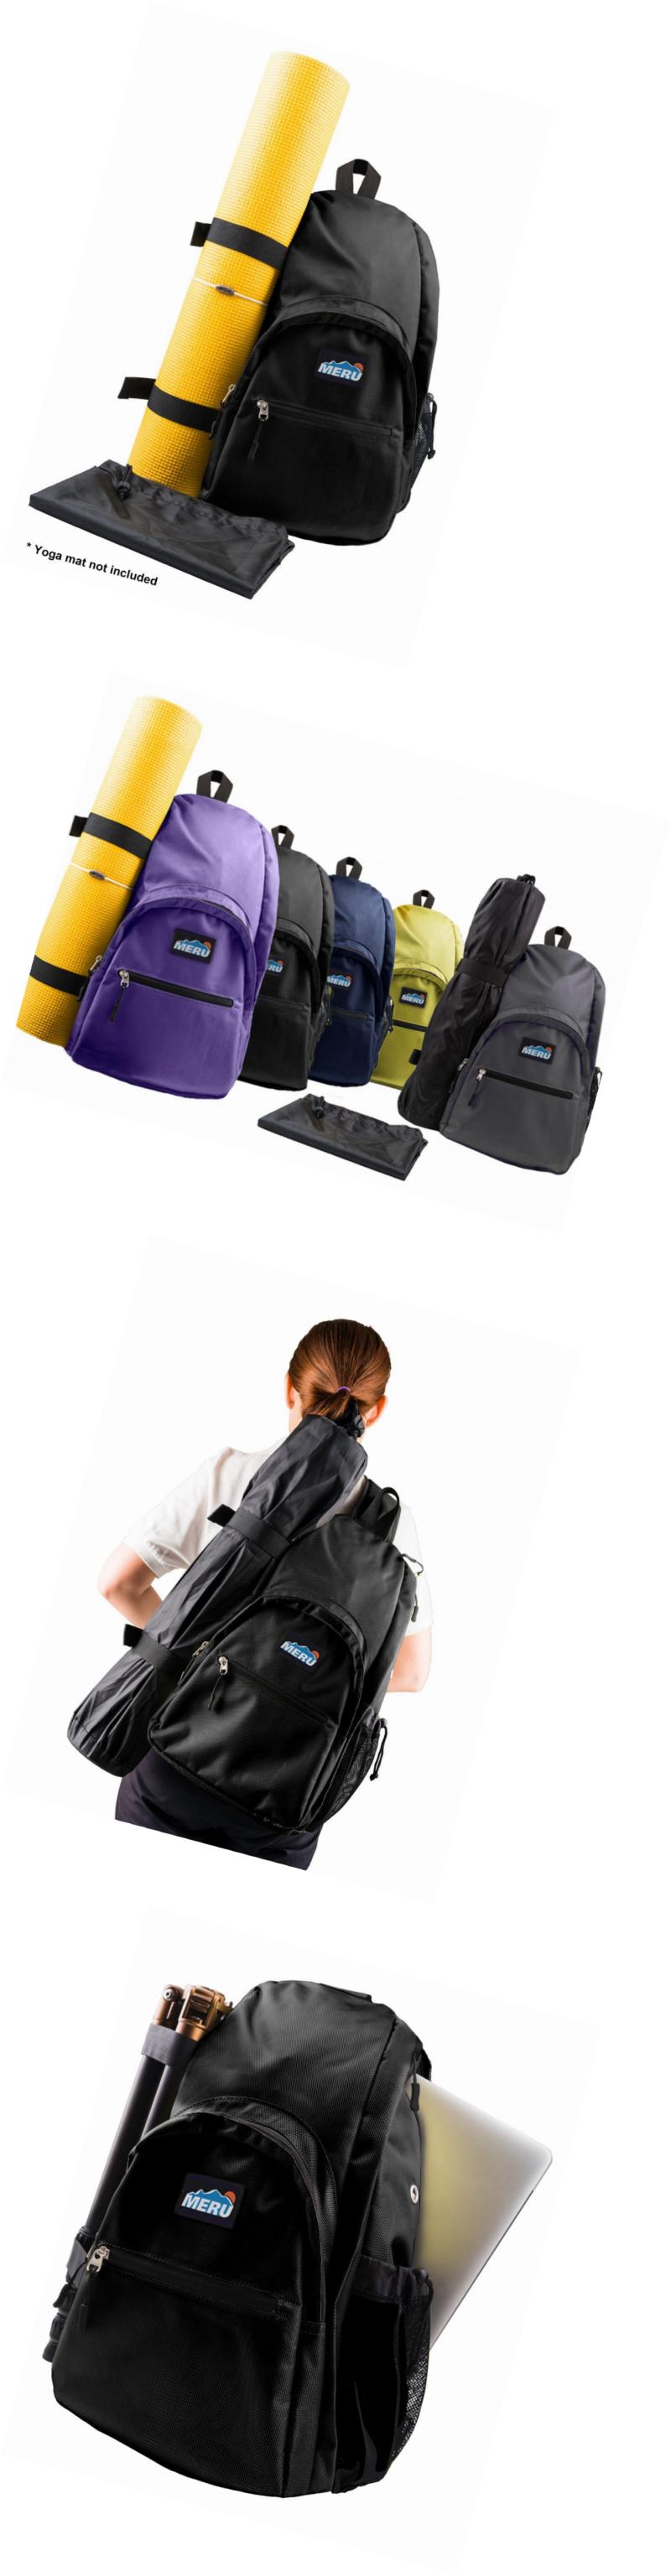 801518ab4f Mat Carriers and Bags 158929  Meru Yoga Sling Backpack - Waterproof  Crossbody Bag - Gym